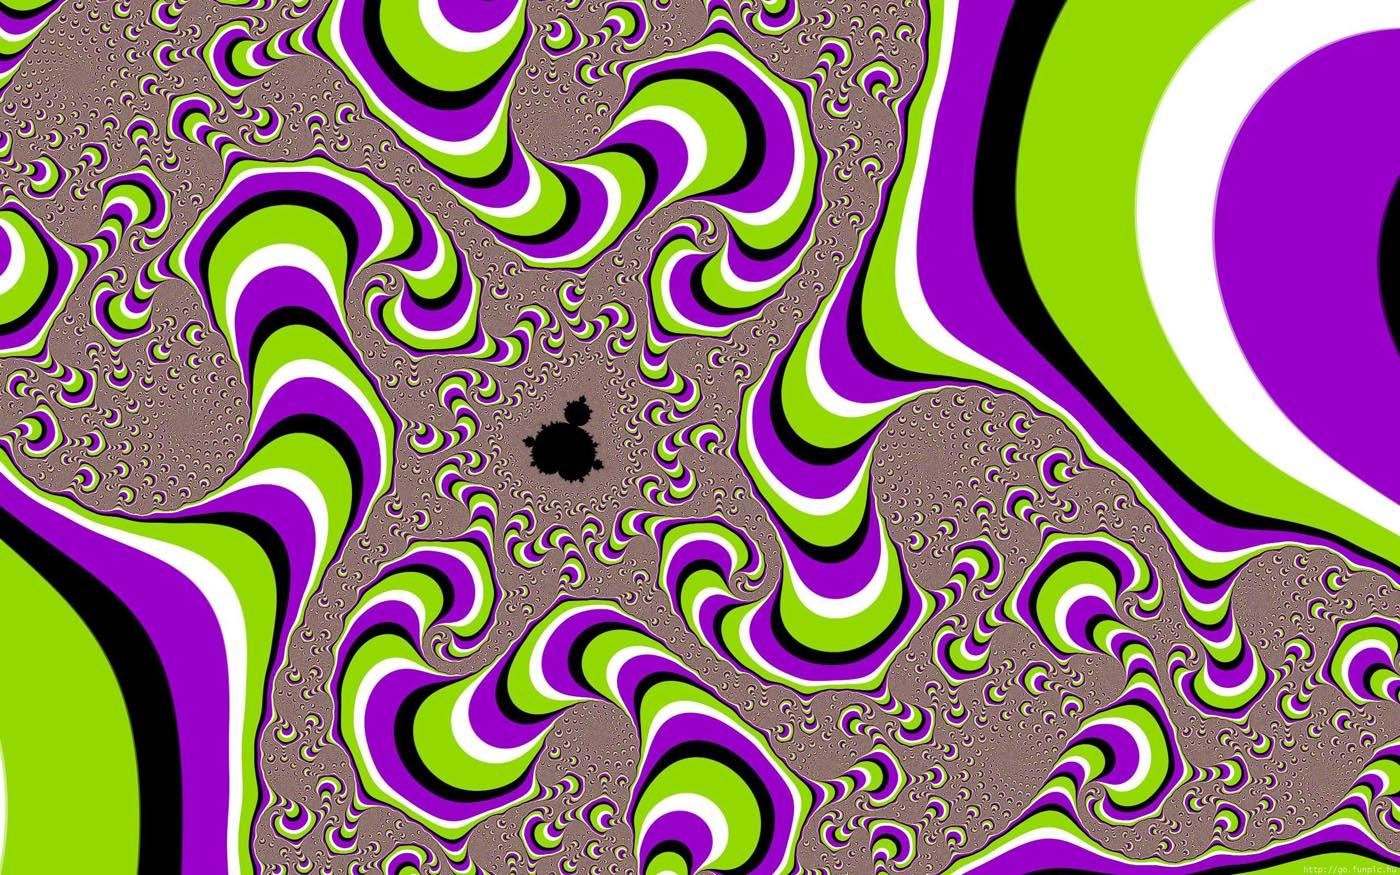 http://1.bp.blogspot.com/-6sXyjYpEzkc/TsfXtNLEPsI/AAAAAAAANqo/IF8vzLwCRy8/s1600/psychedelic-screen-melt.jpg